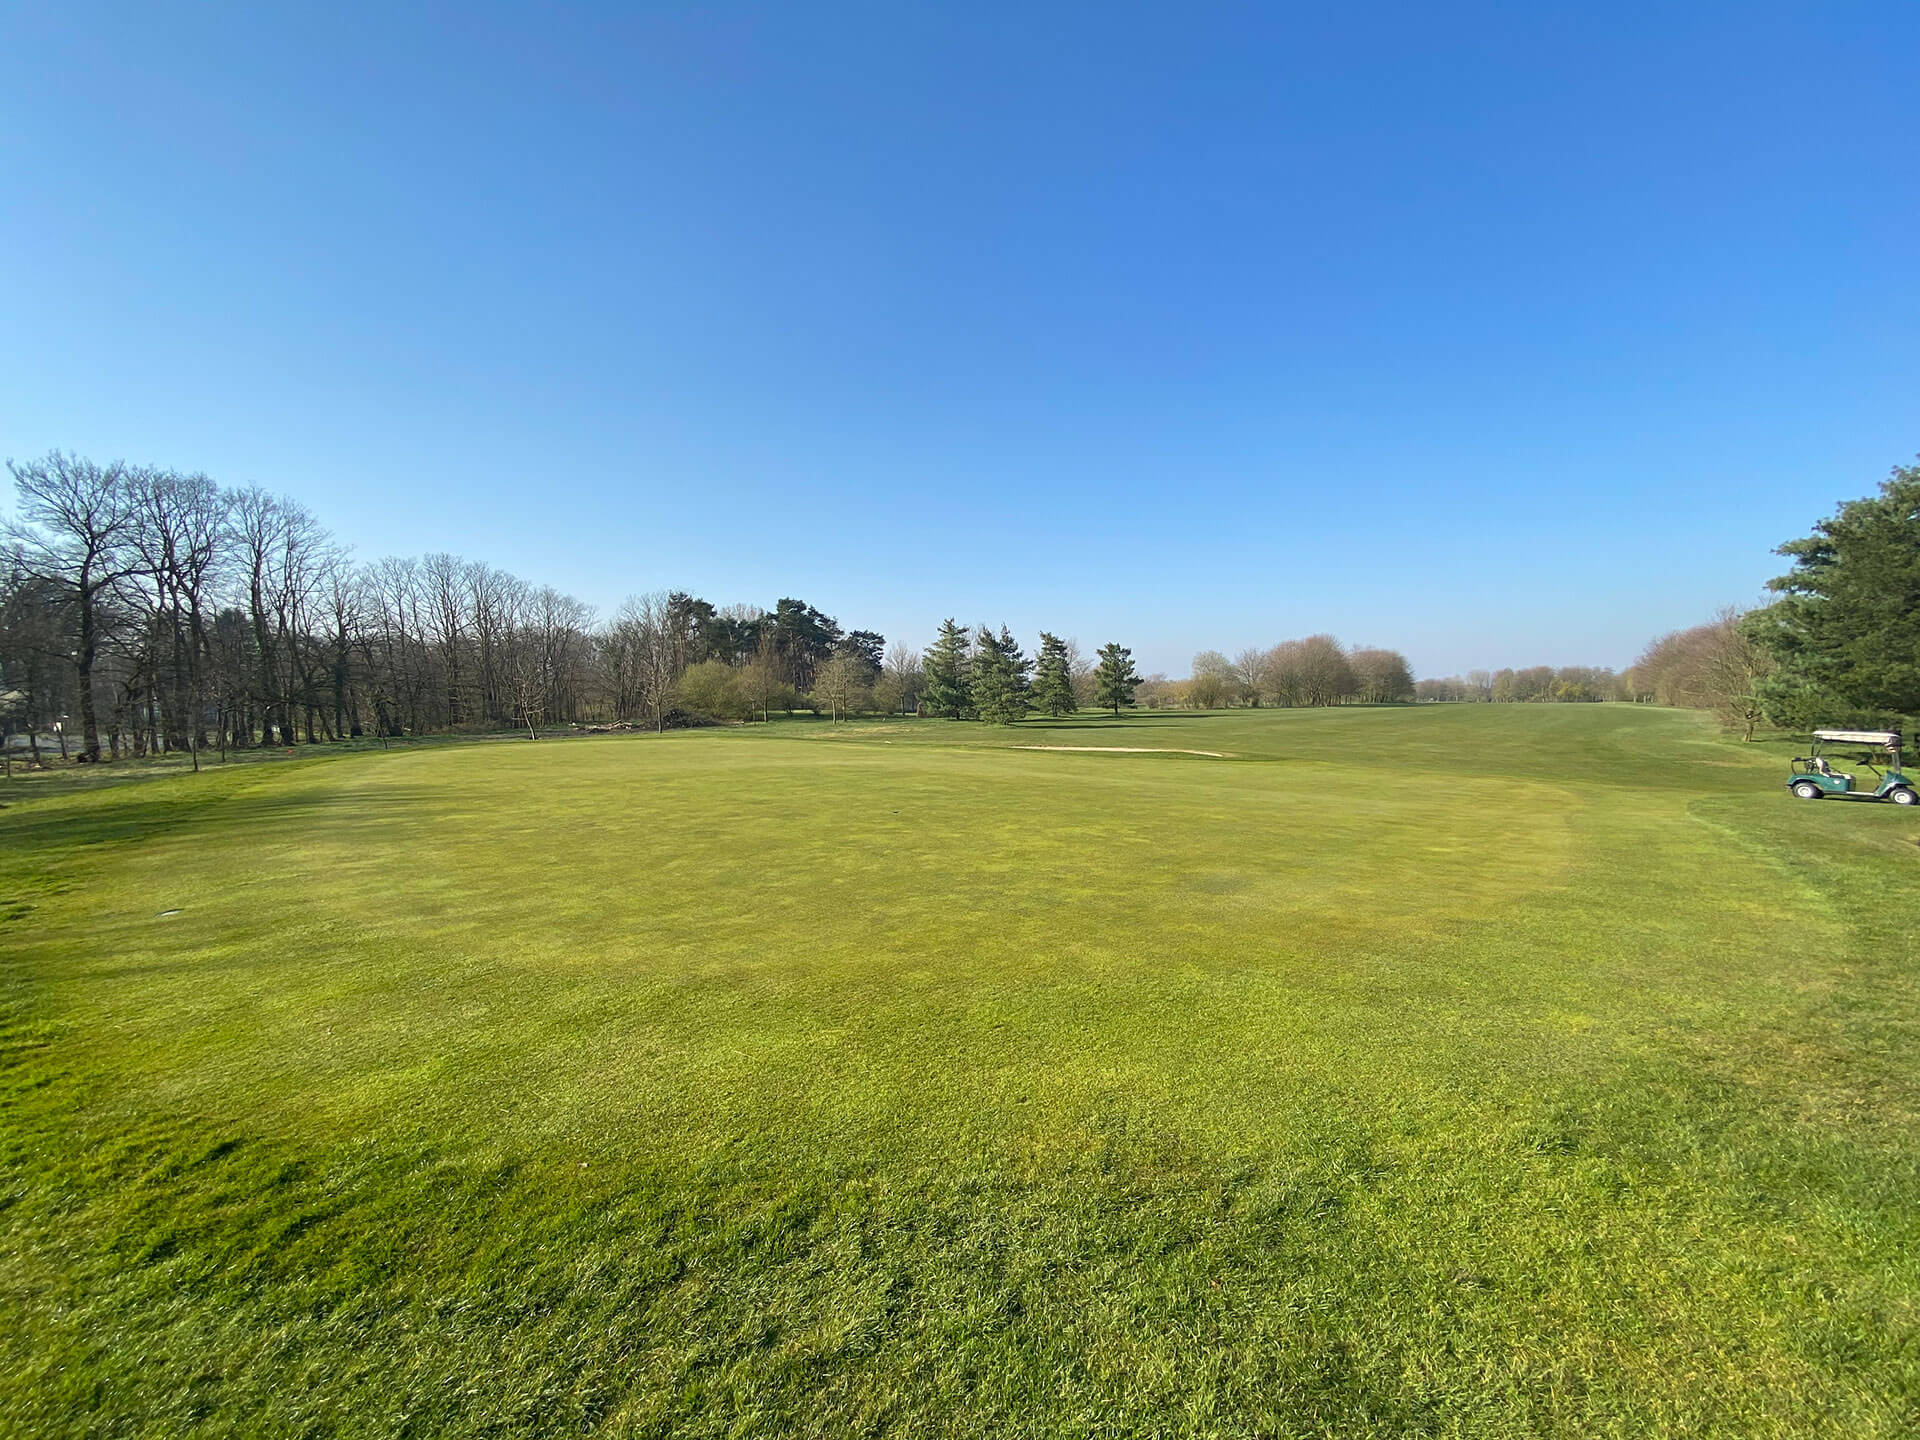 https://golfclub-peckeloh.de/wp-content/uploads/2020/03/IMG_5348.jpg